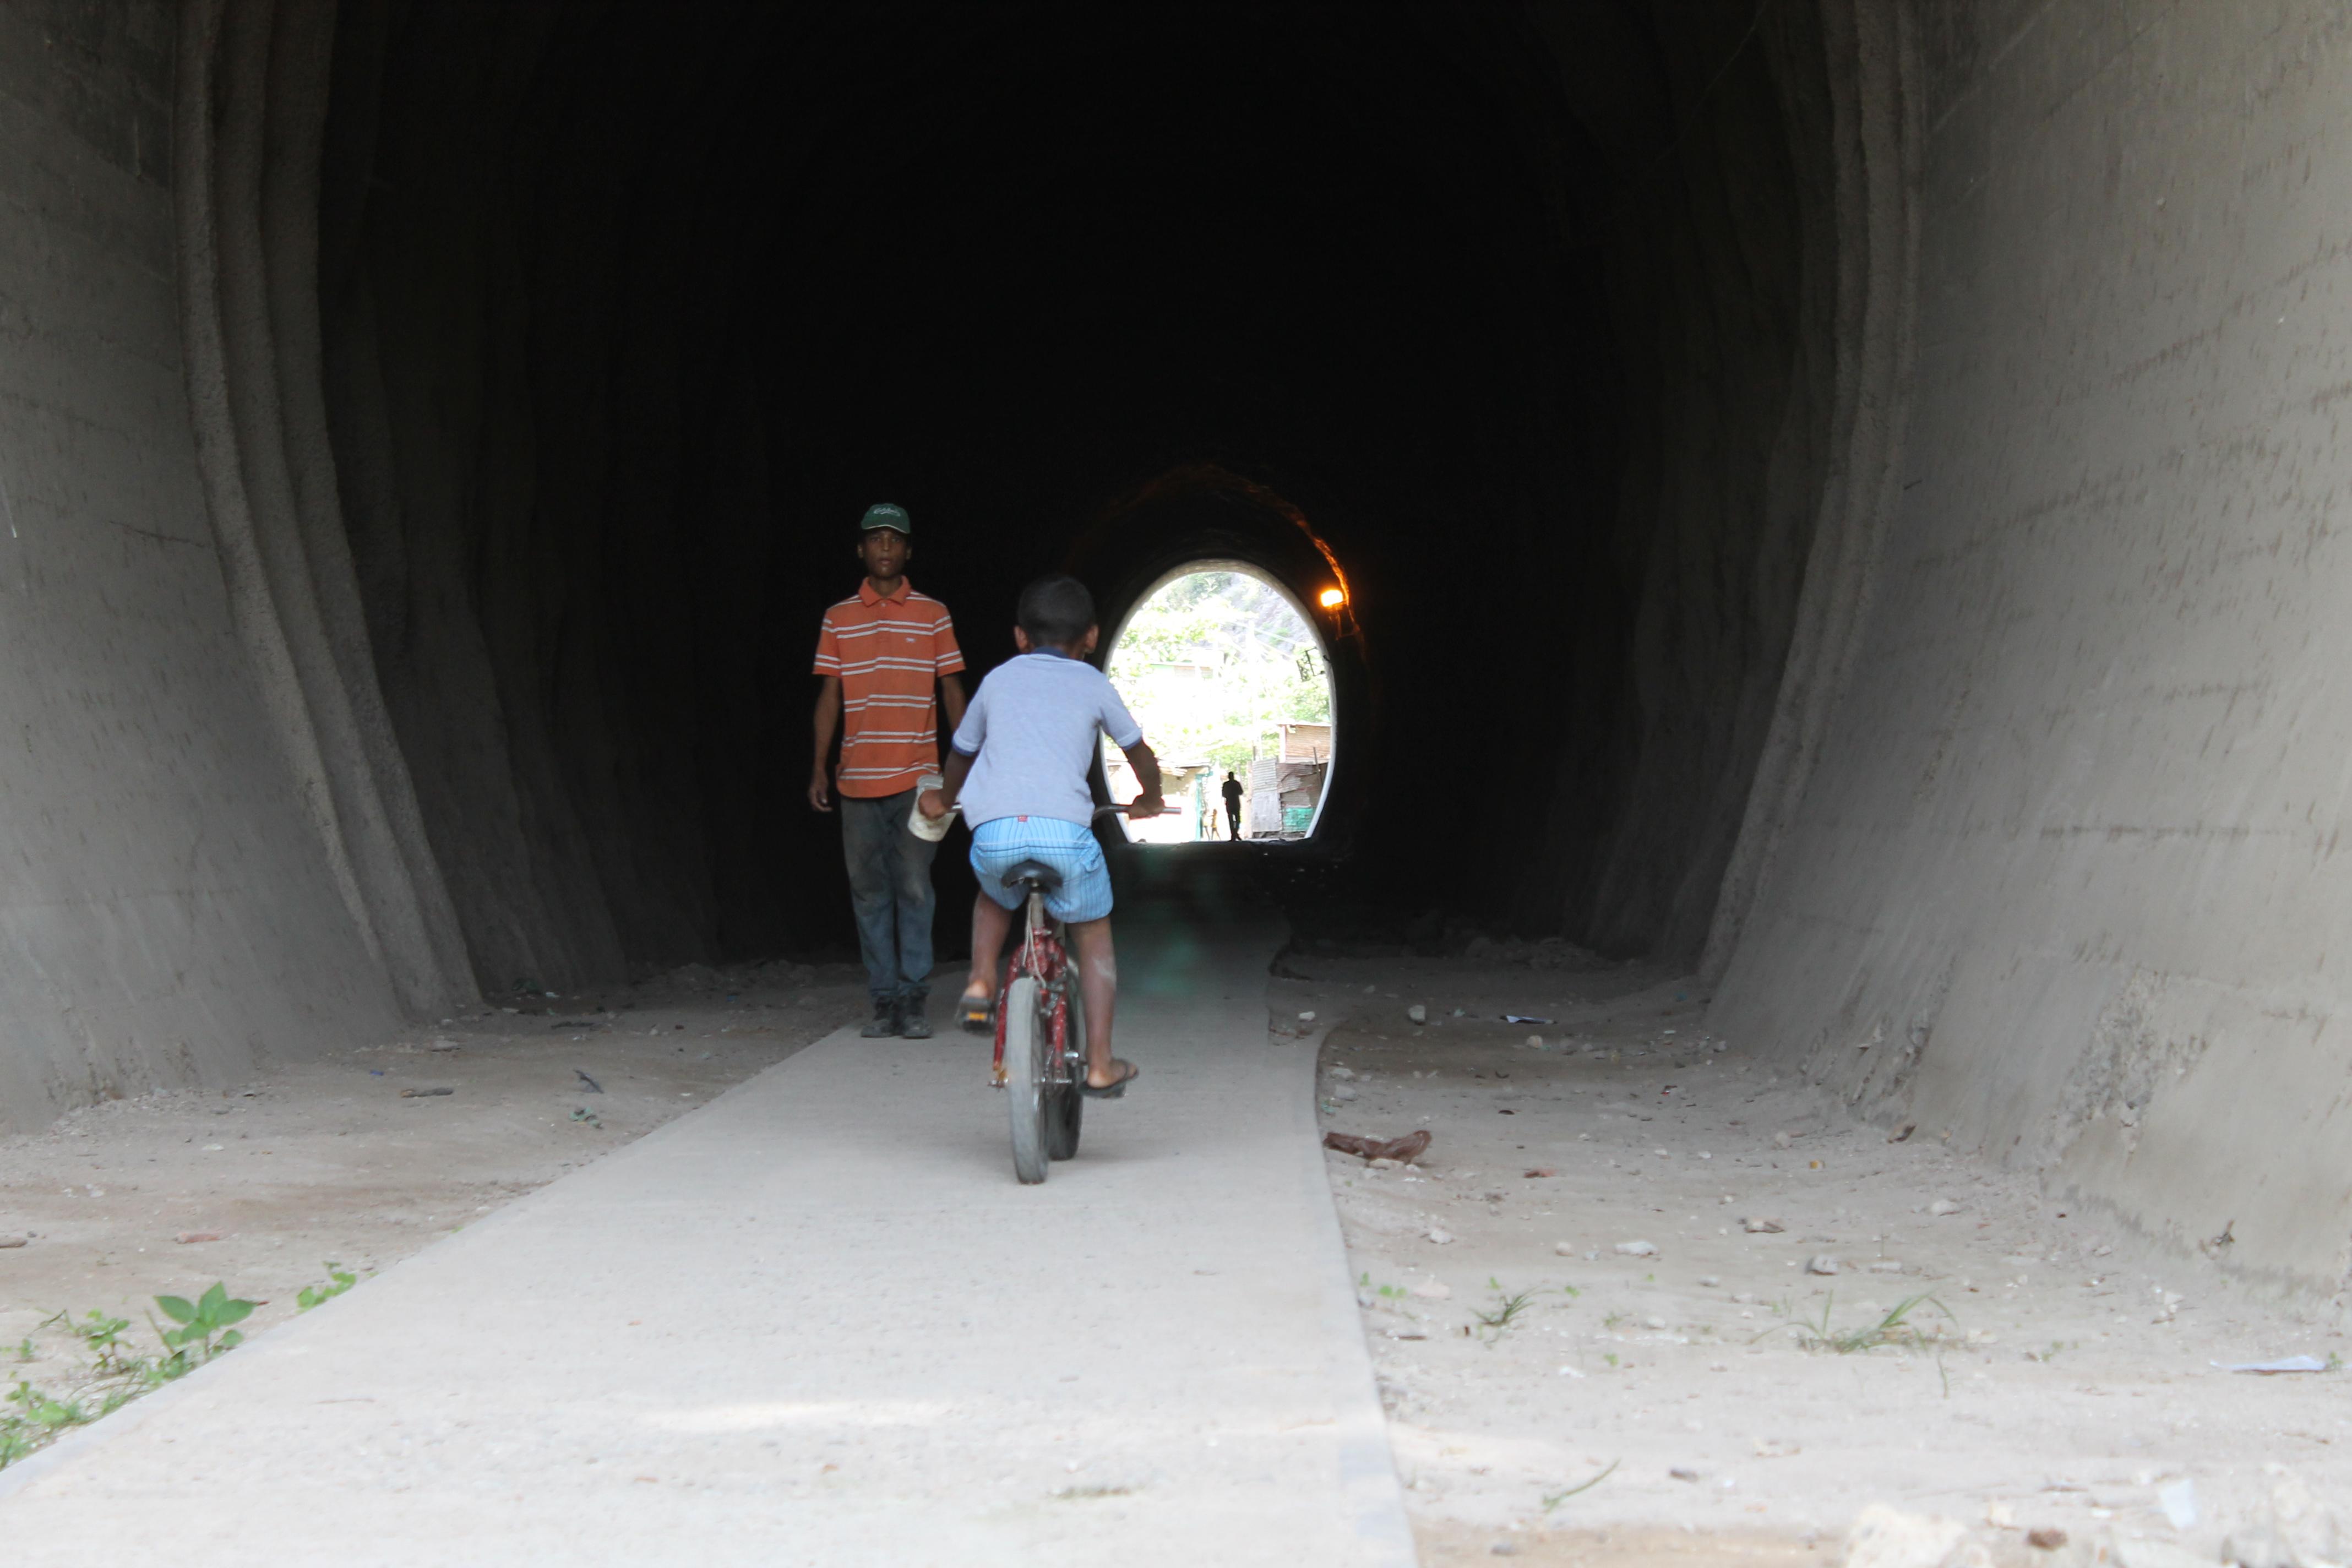 Comunidades guanteñas sin agua ni transporte